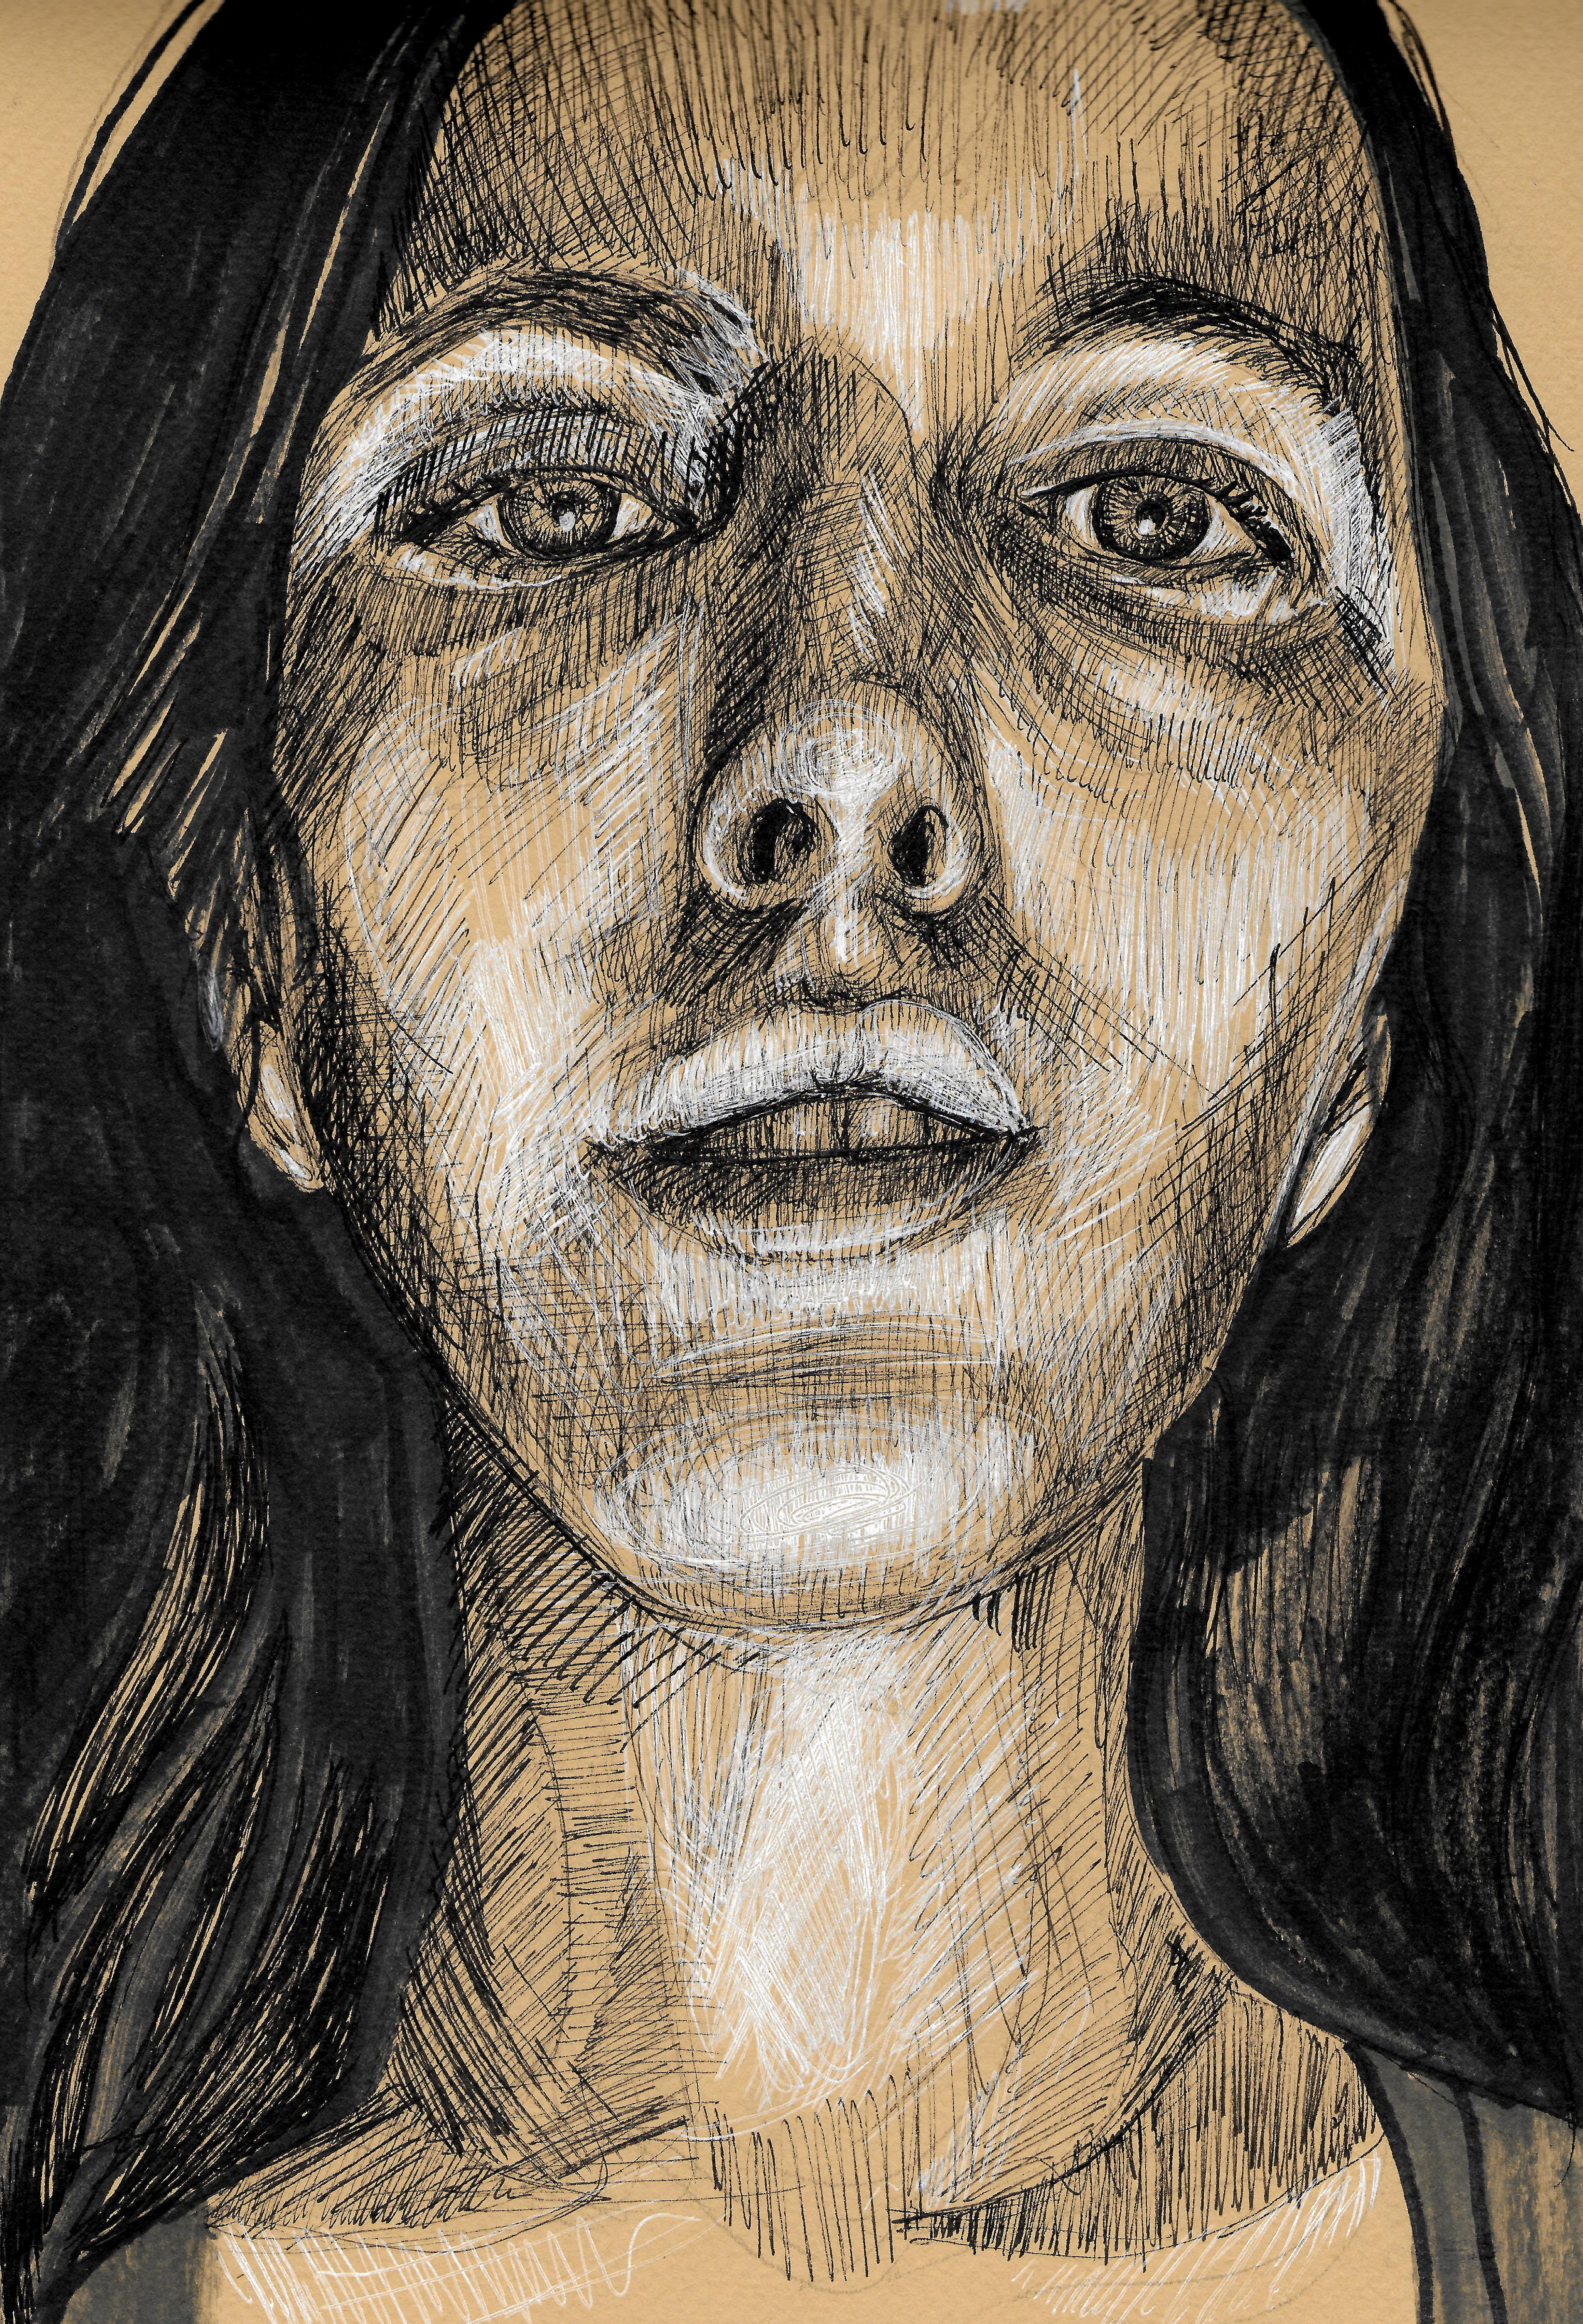 portrait close up on midtone